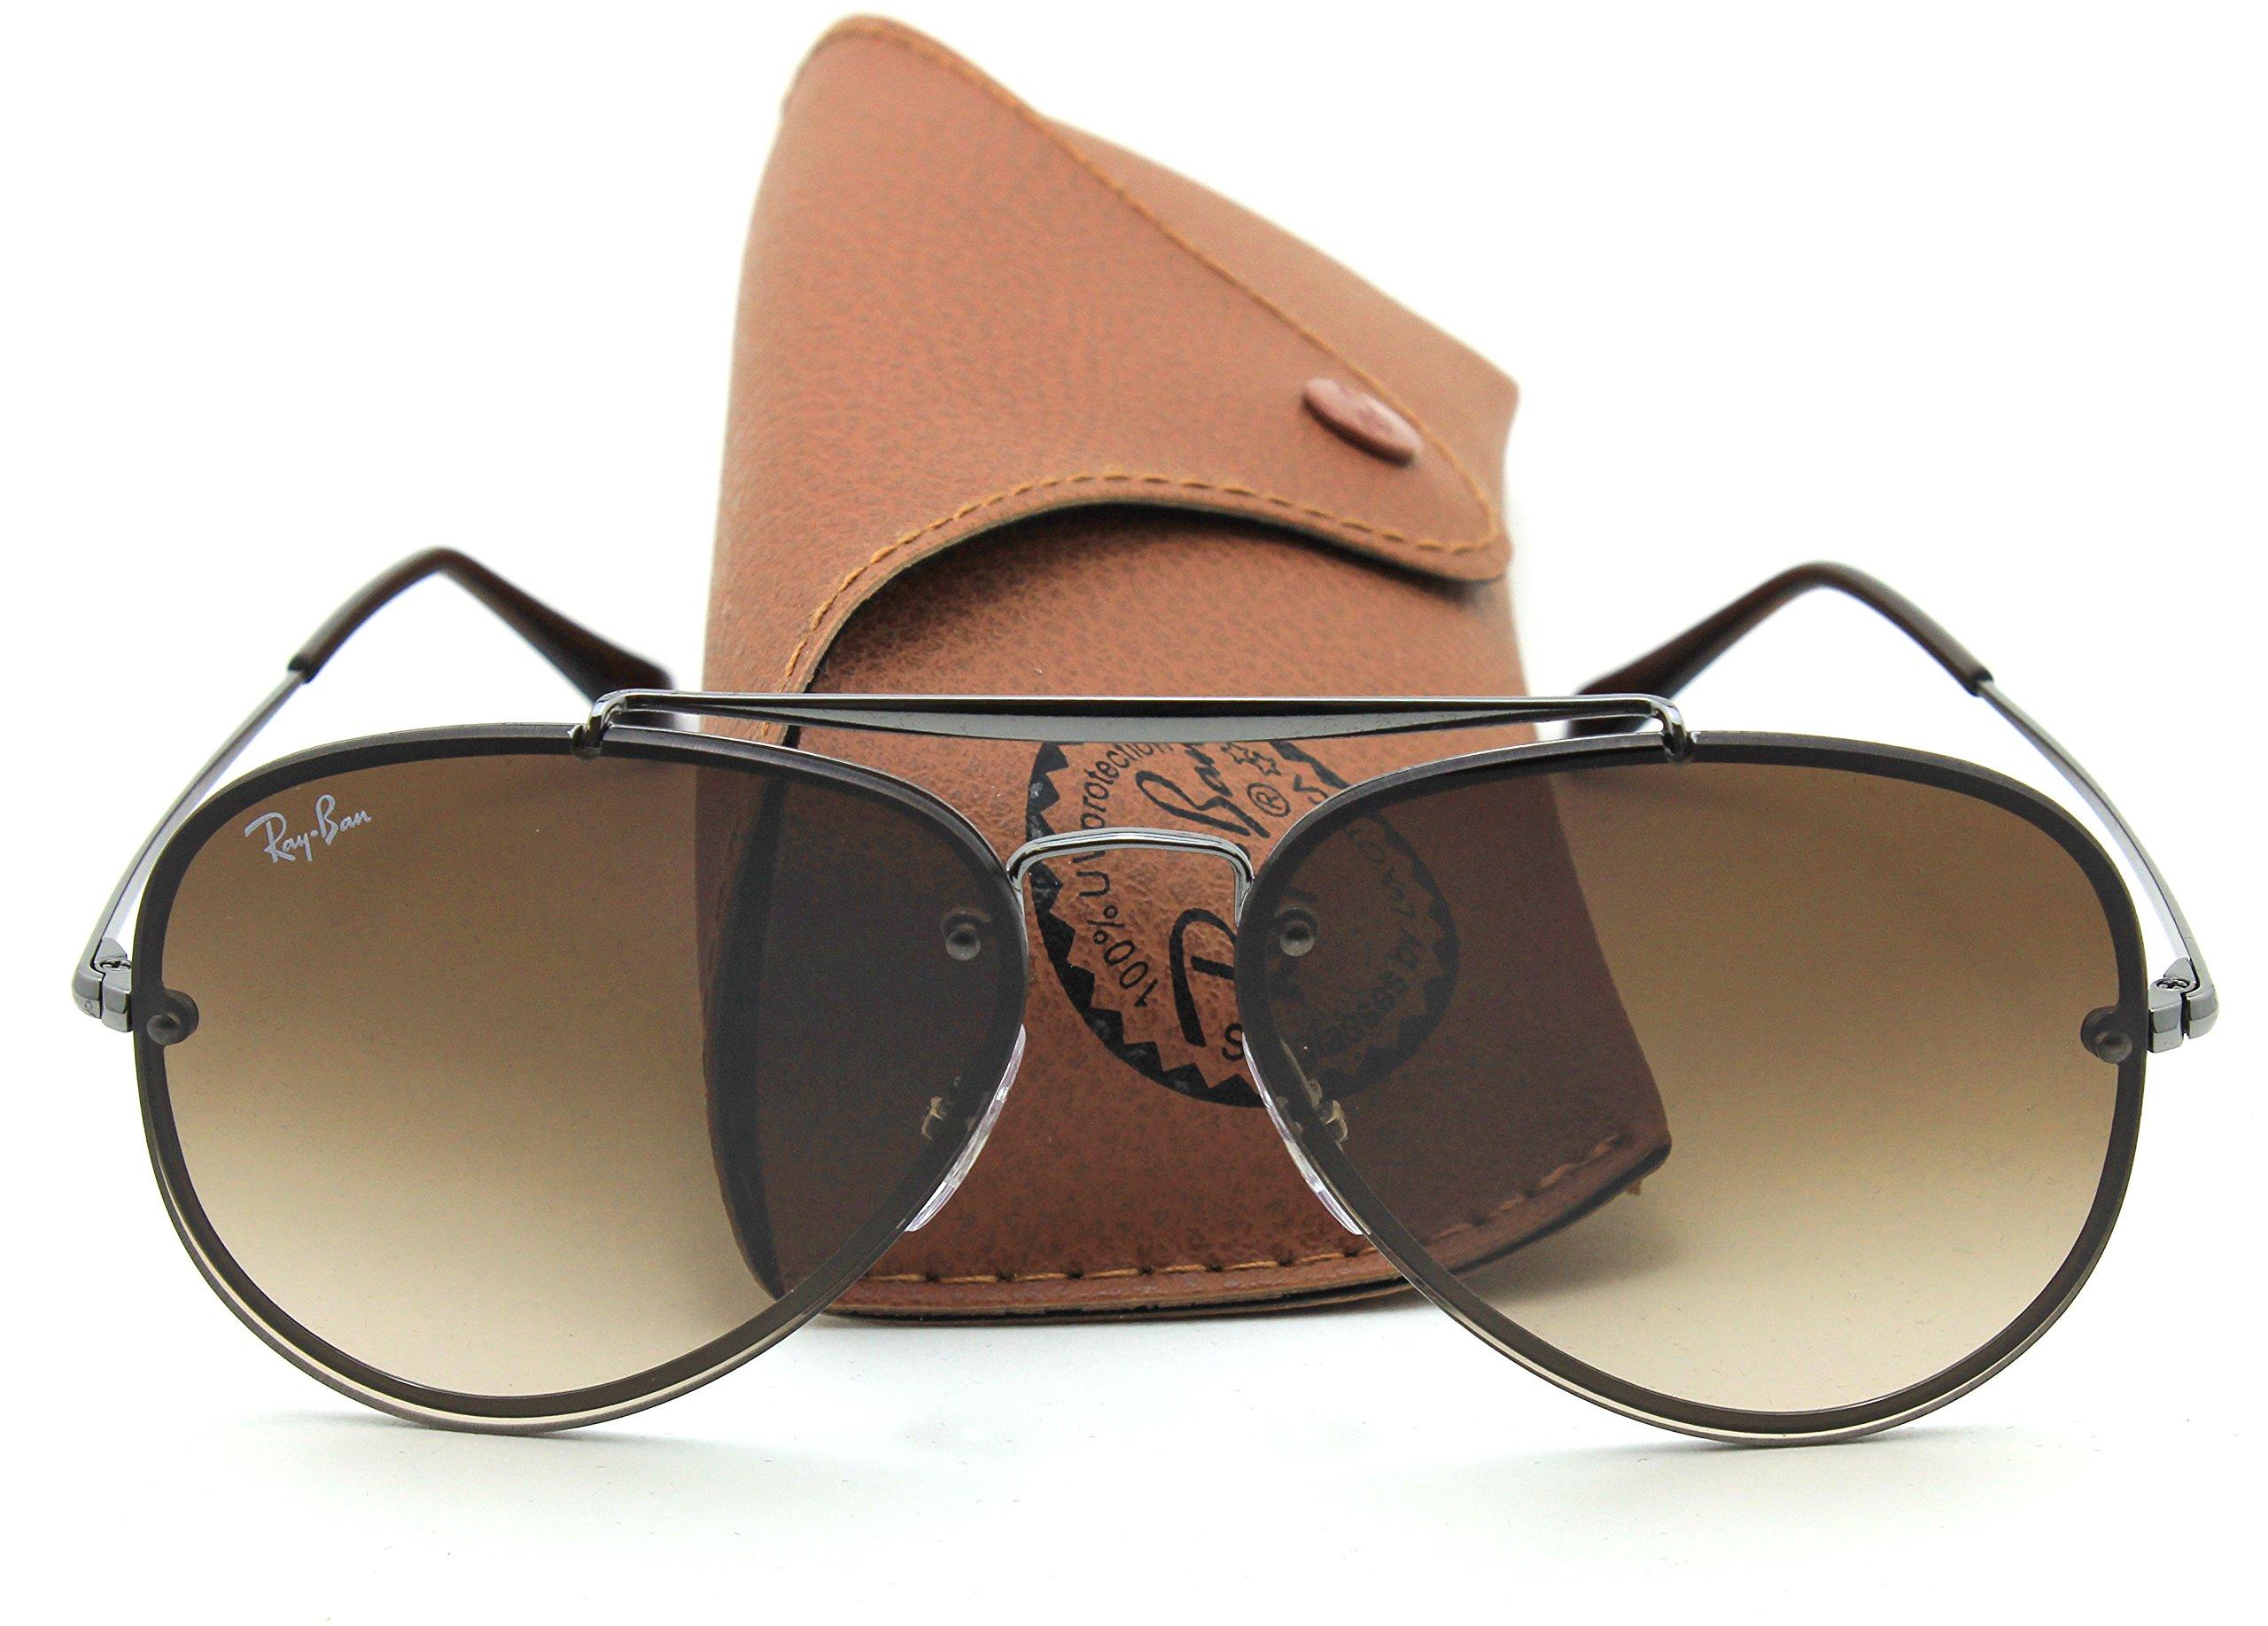 Ray-Ban RB3584N BLAZE AVIATOR Gradient Sunglasses 004/13, 58mm